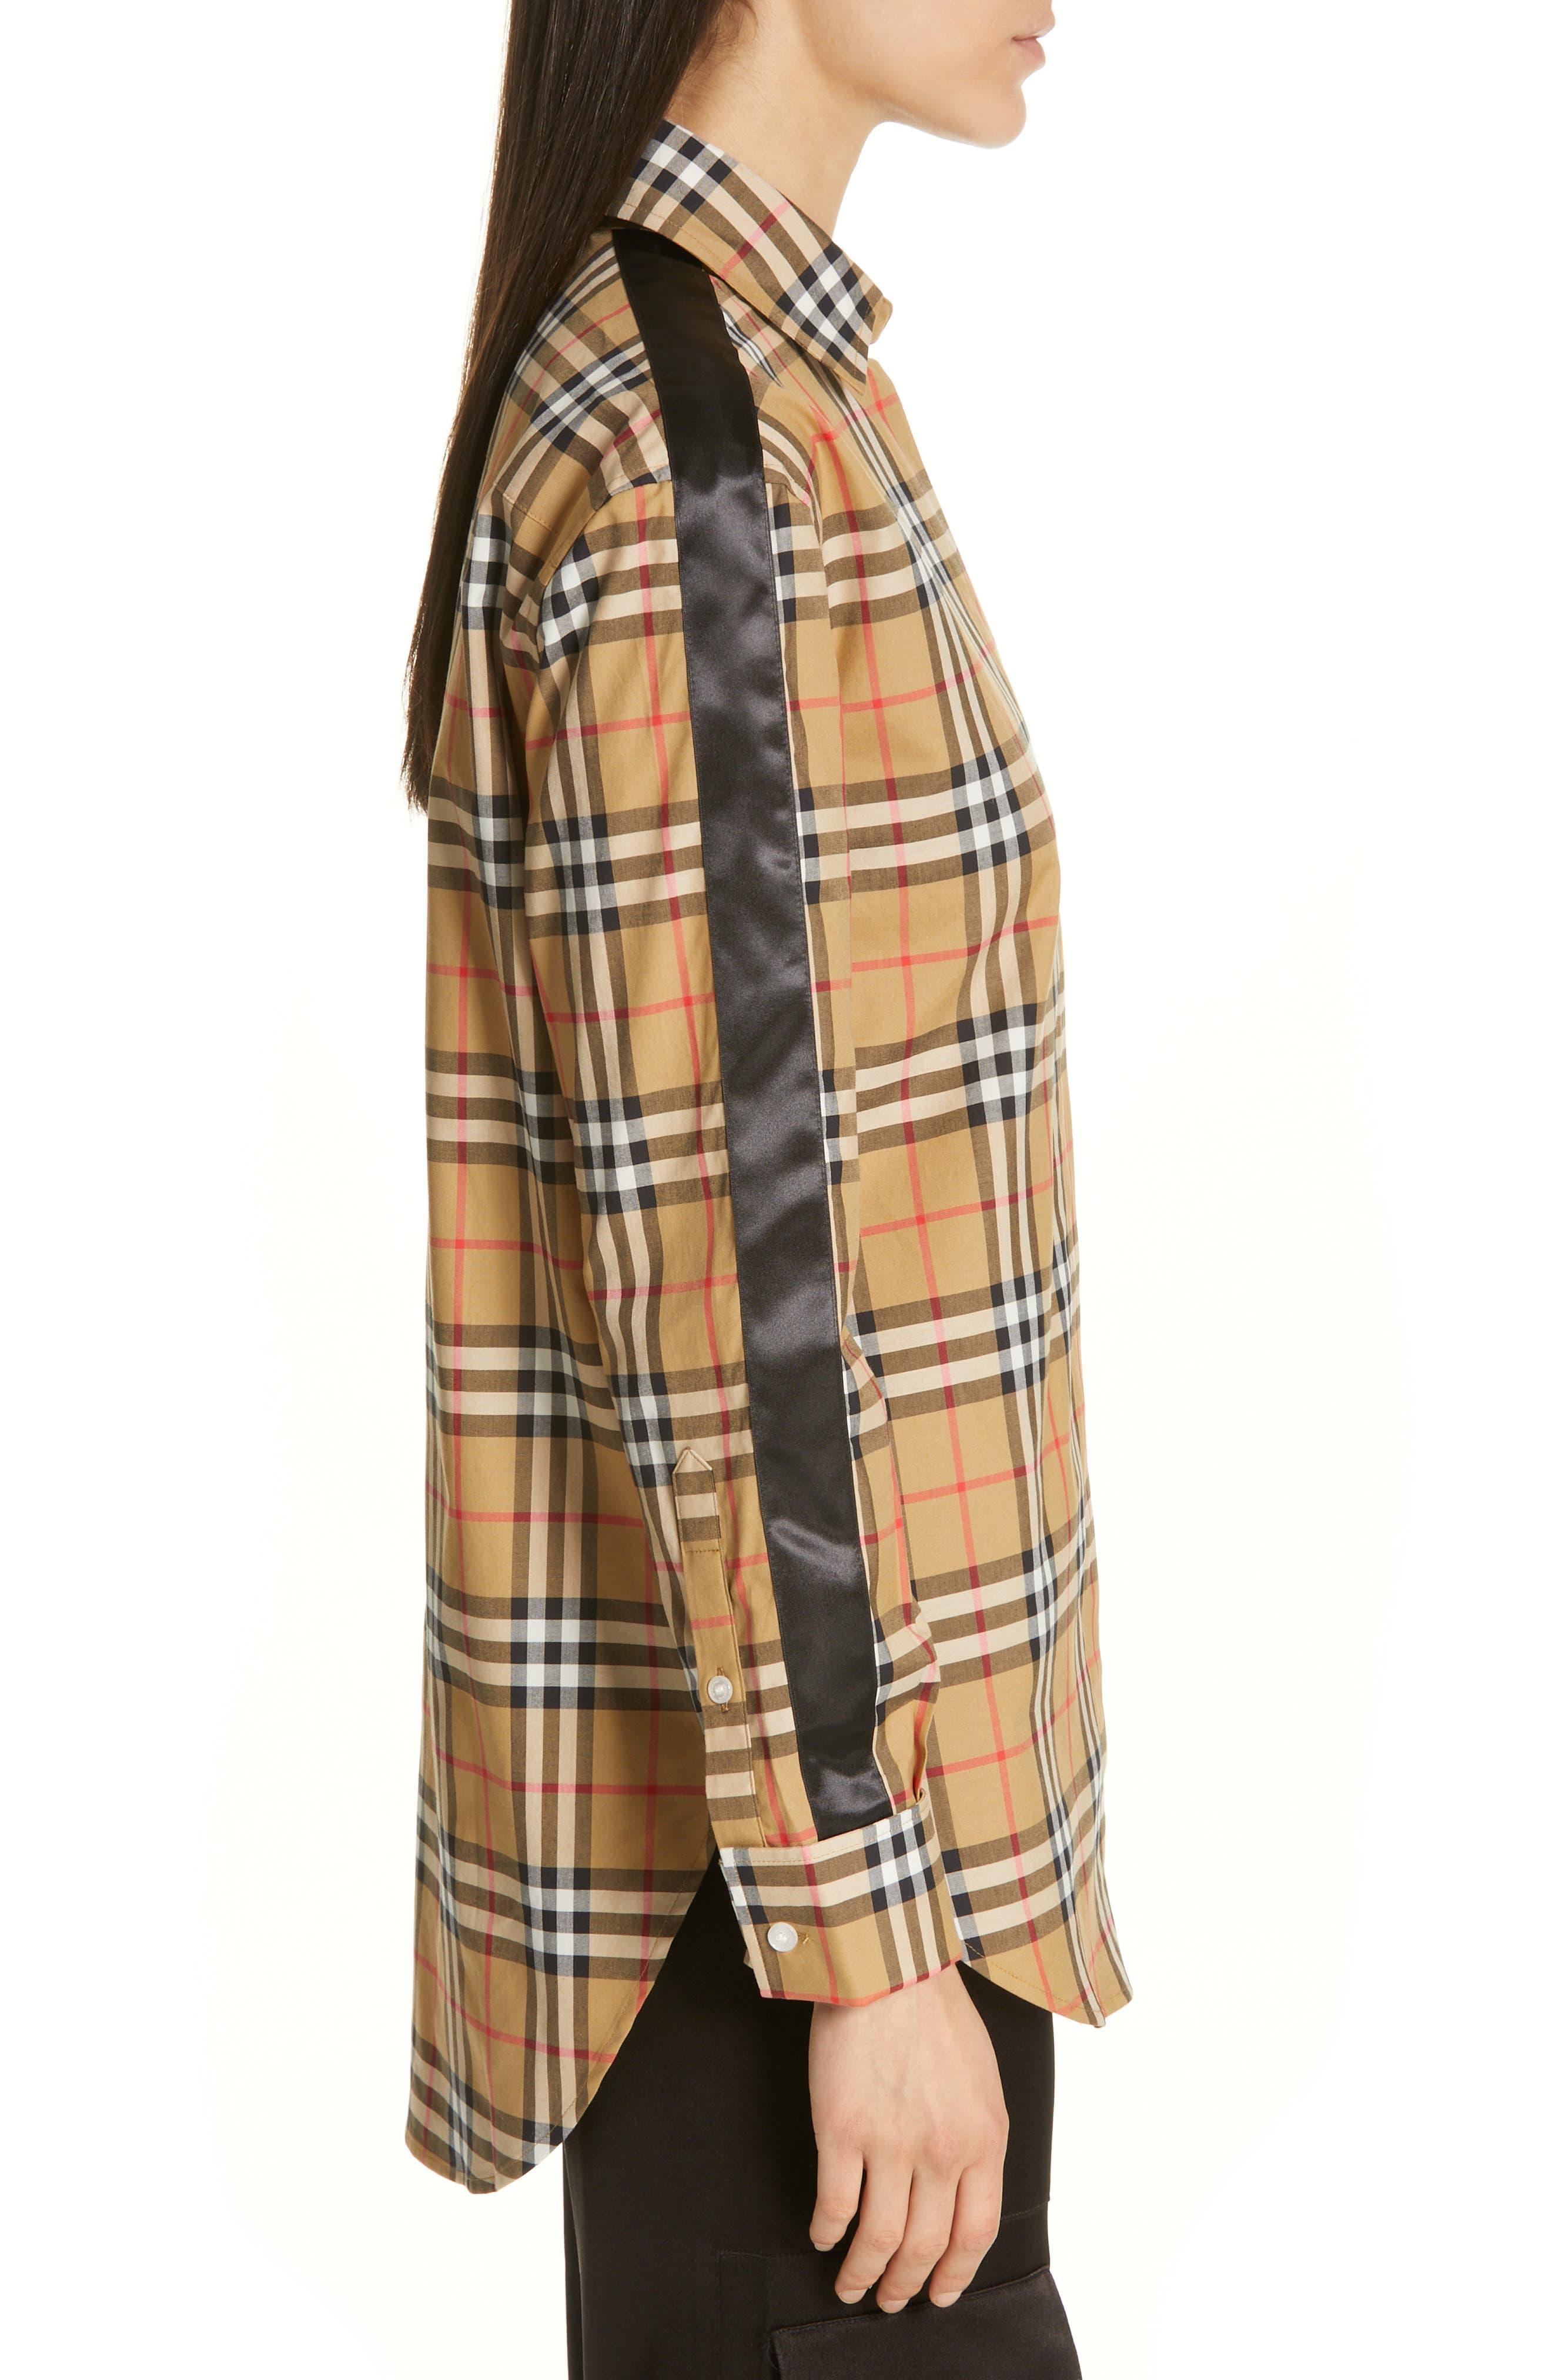 BURBERRY, Saoirse Vintage Check Cotton Shirt, Alternate thumbnail 4, color, ANTIQUE YELLOW CHECK